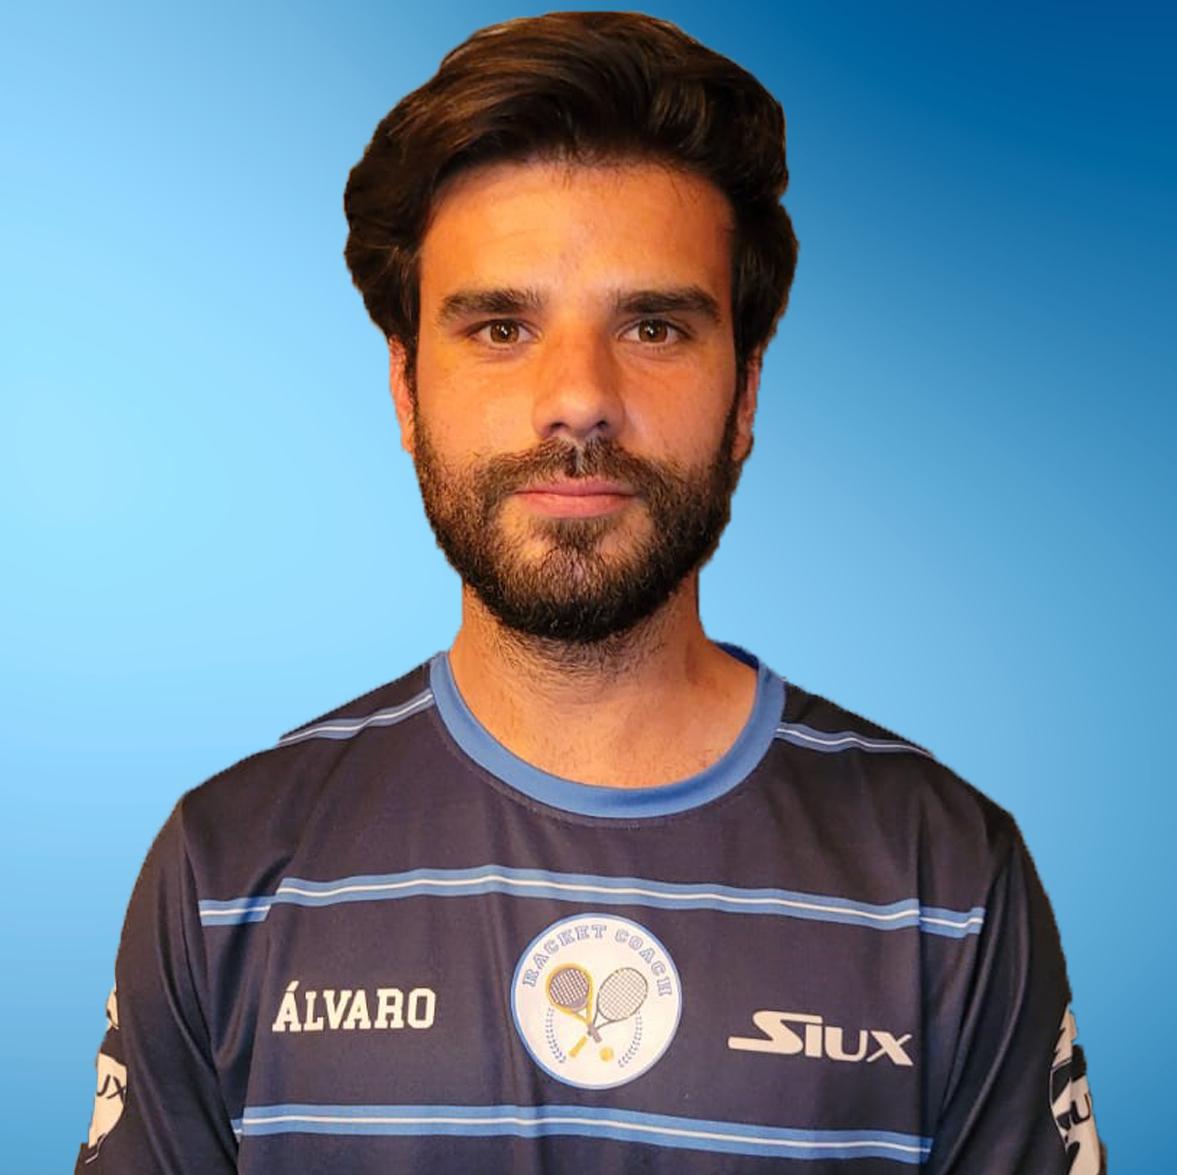 Álvaro Claver